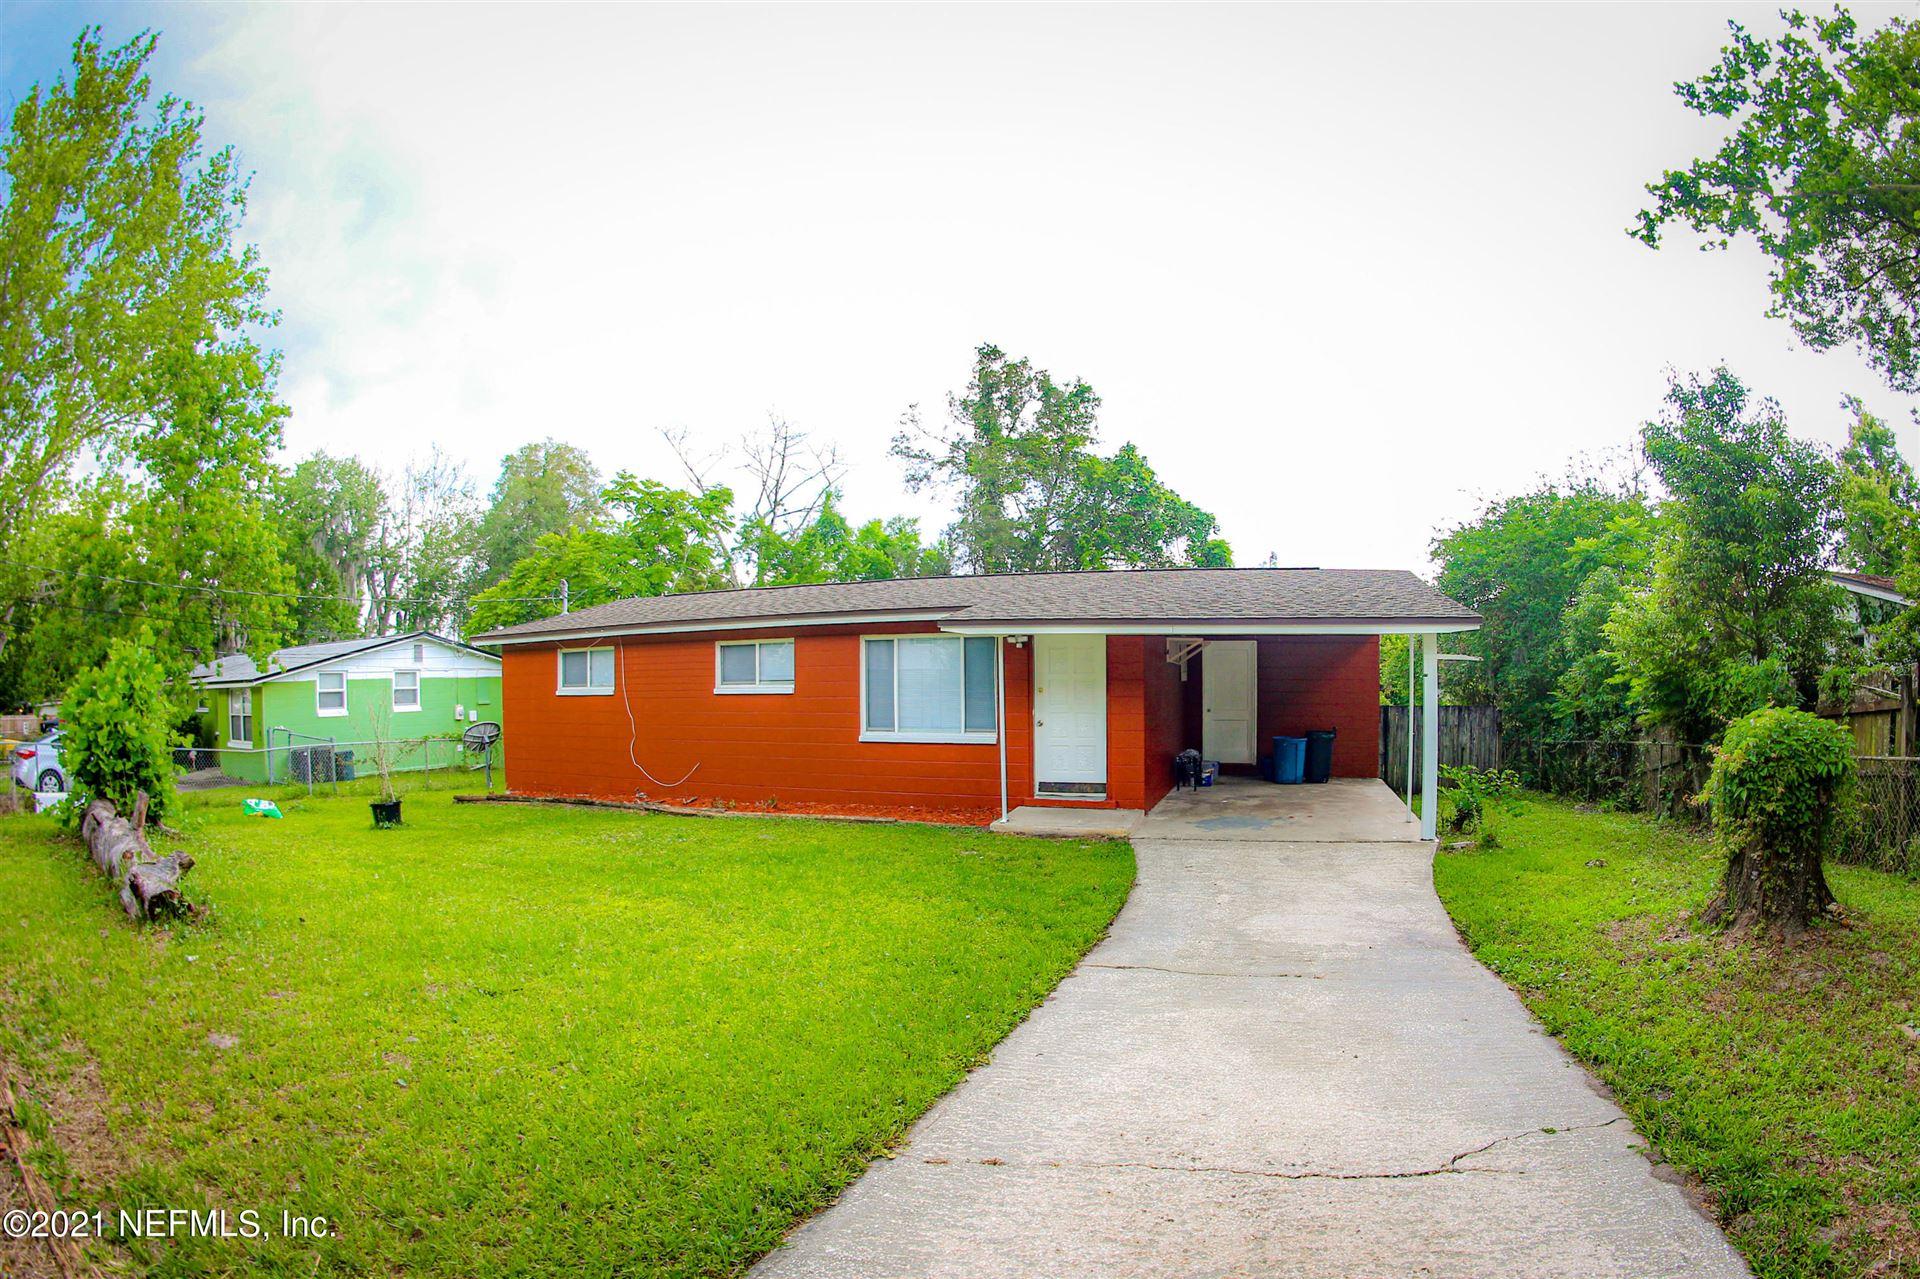 380 GWINNETT RD, Orange Park, FL 32073 - MLS#: 1108135